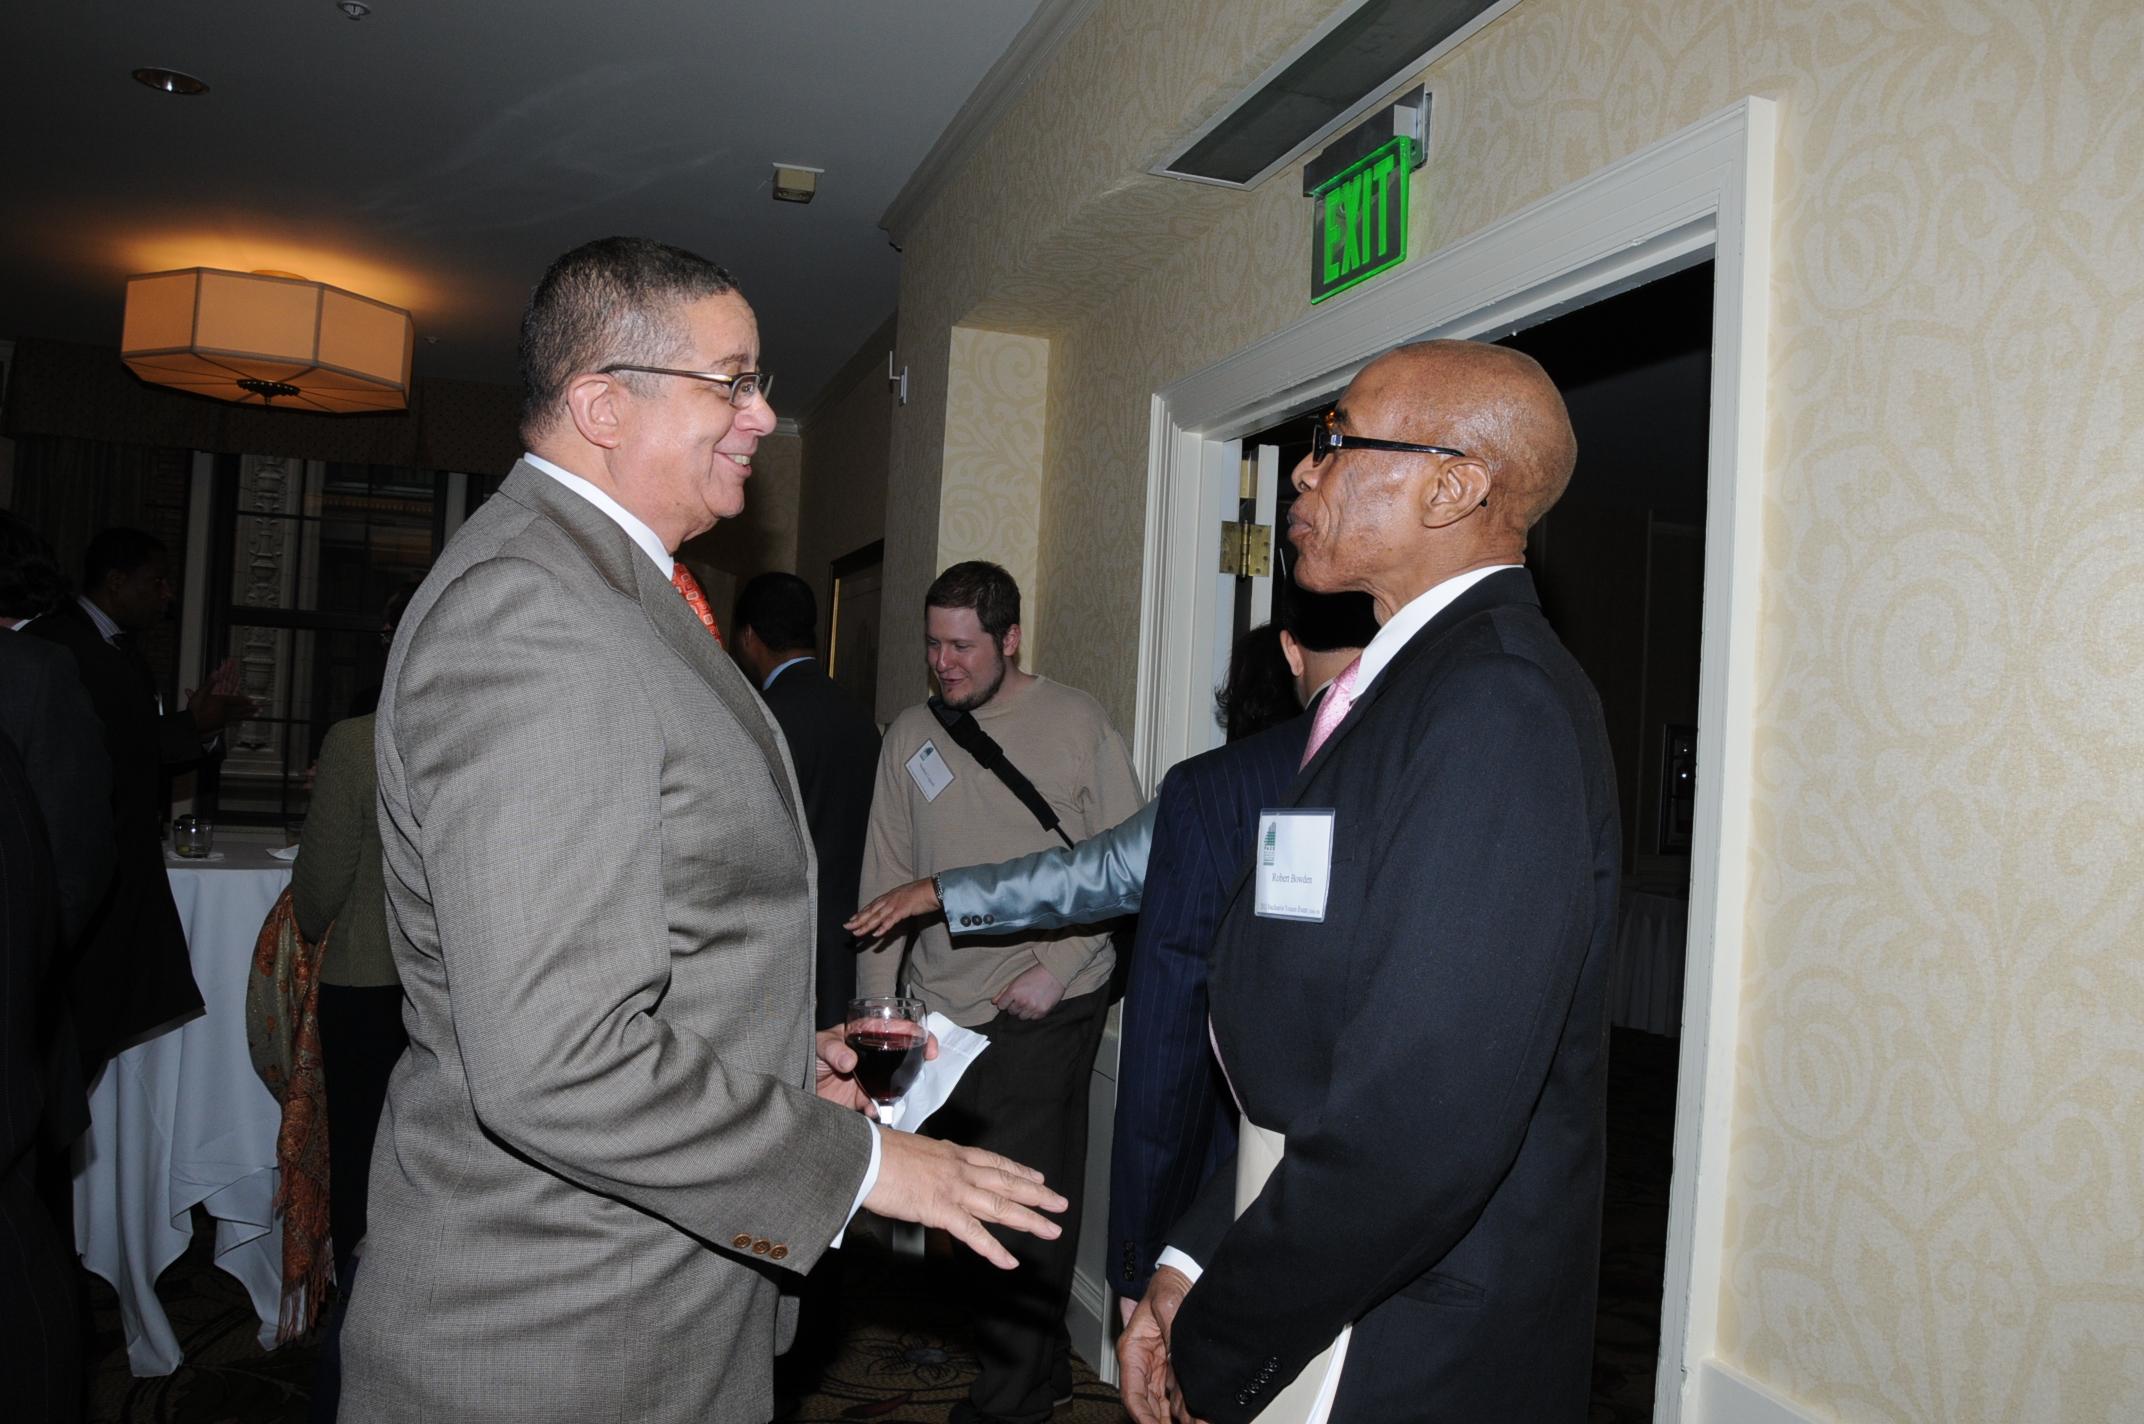 Greg Spencer & Robert Bowden.JPG